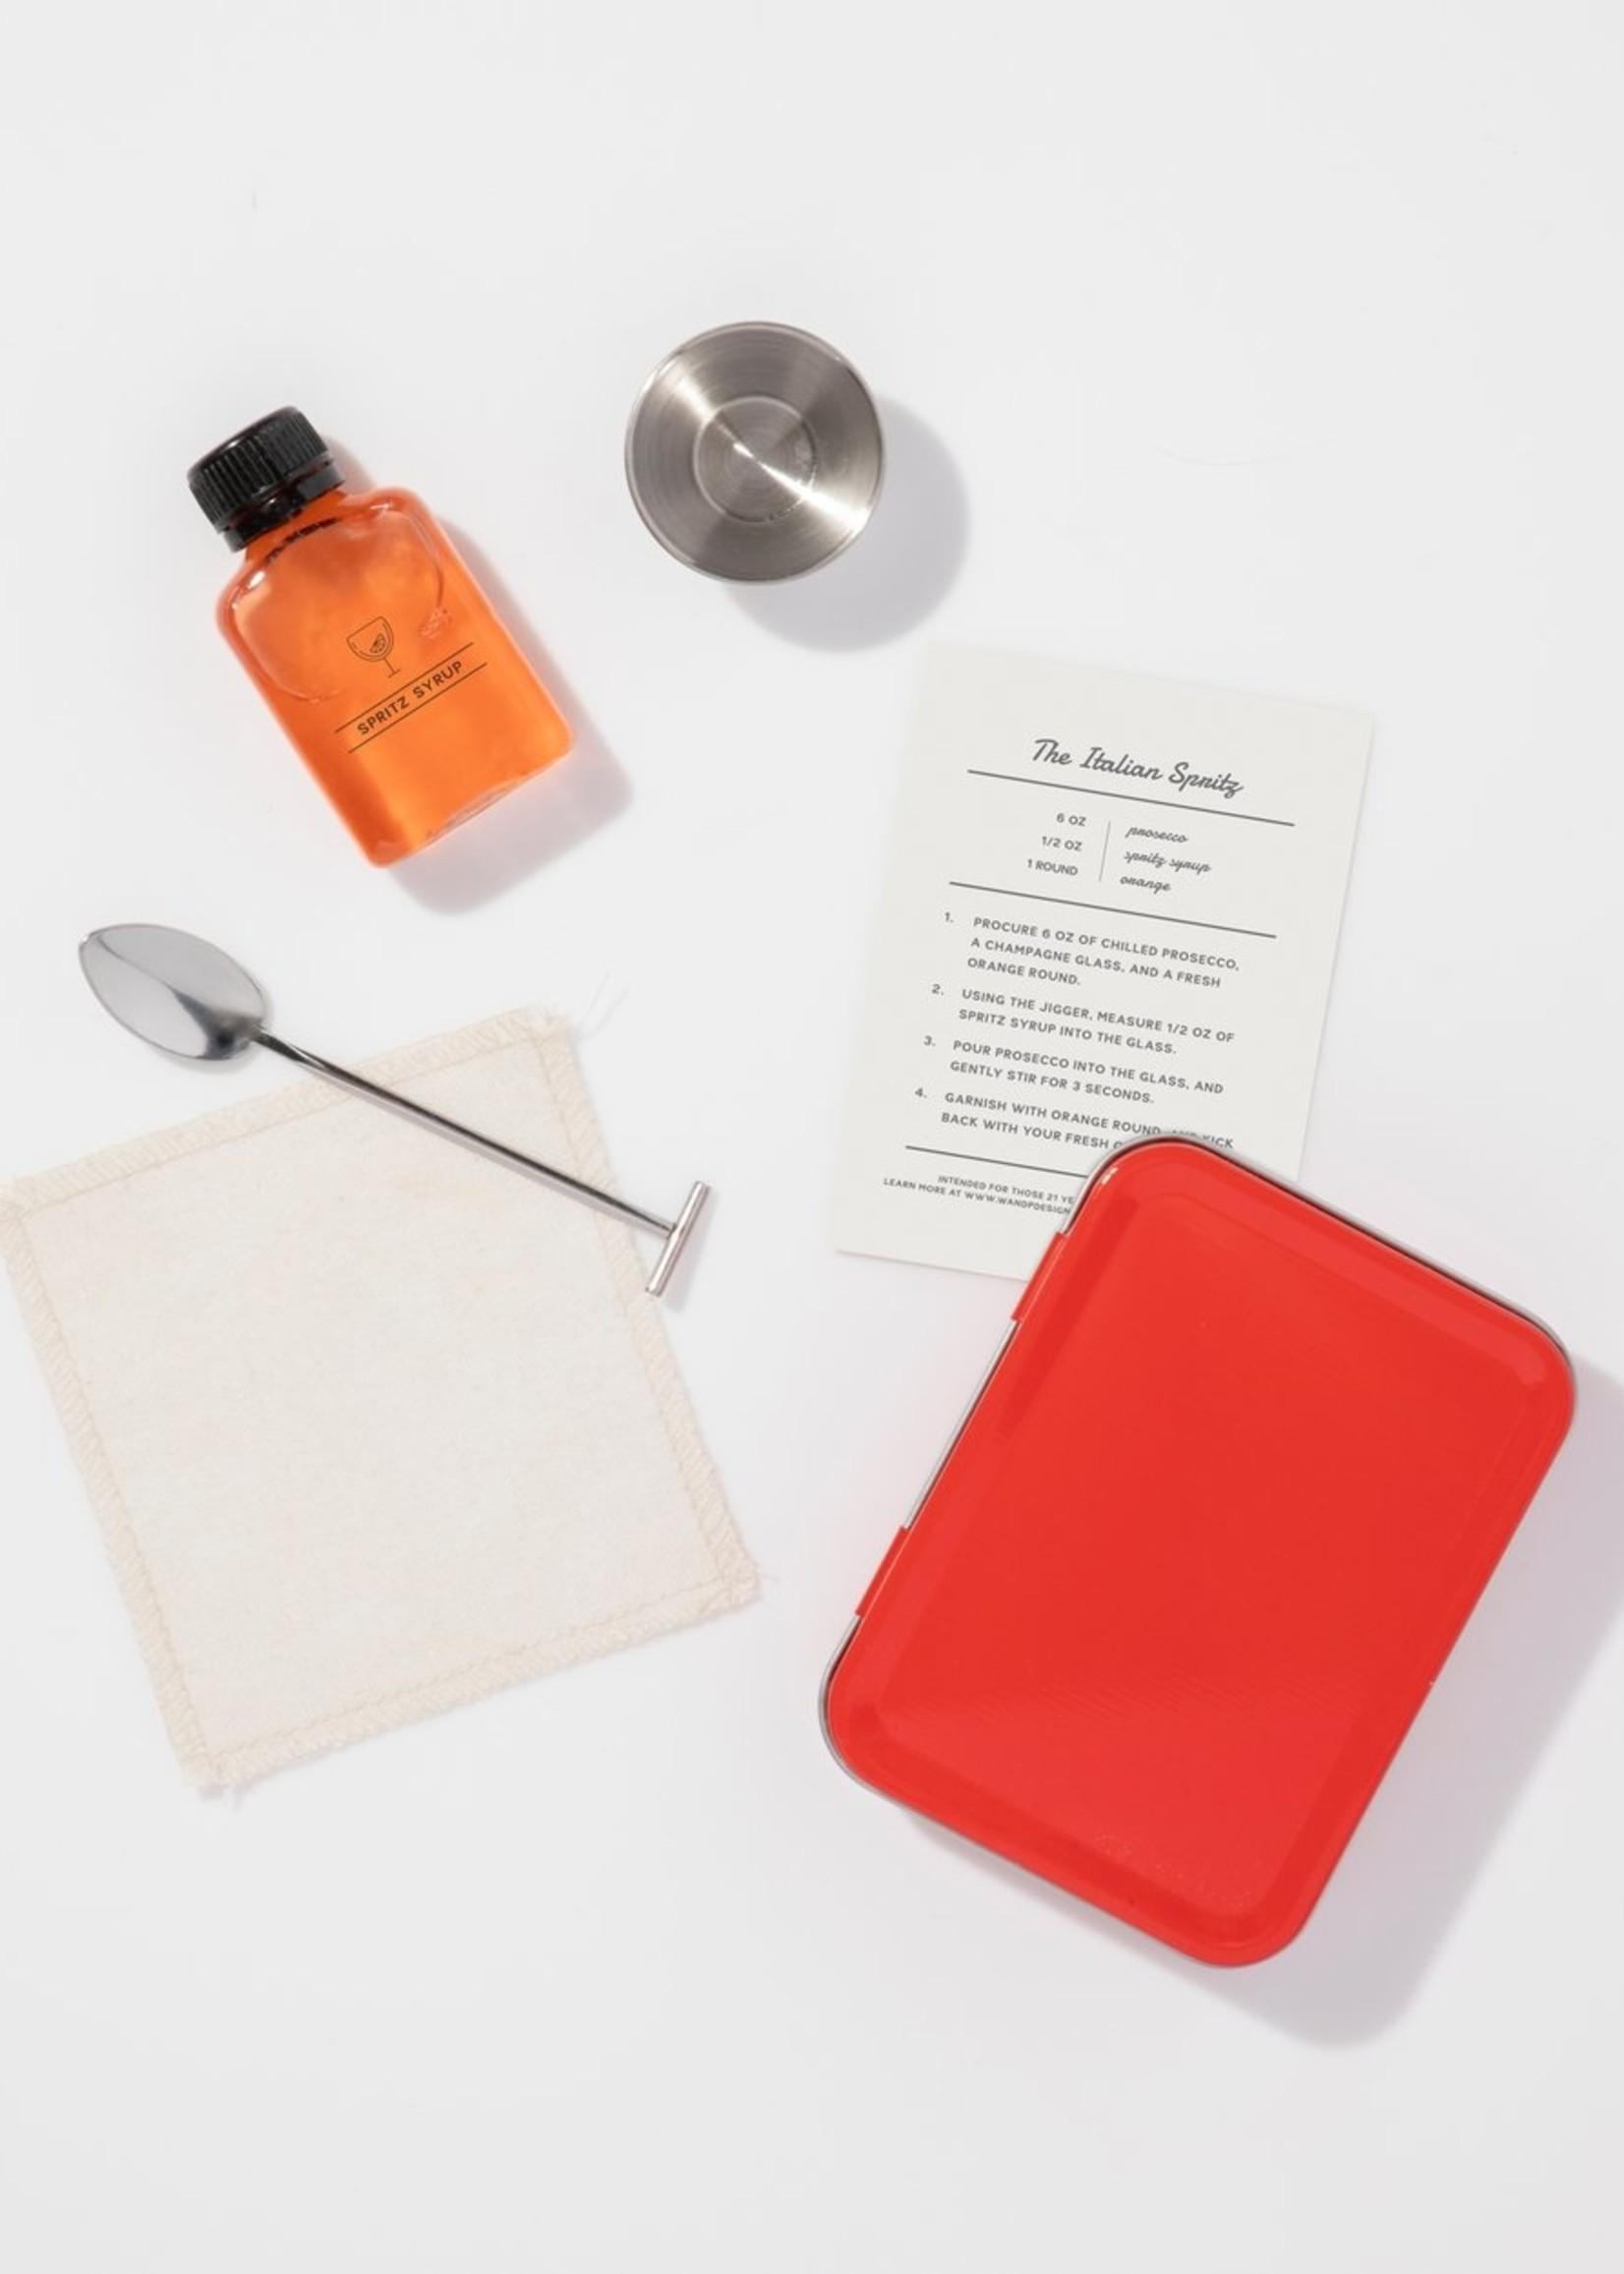 W&P Design Carry On Cocktail Kit - Italian Spritz